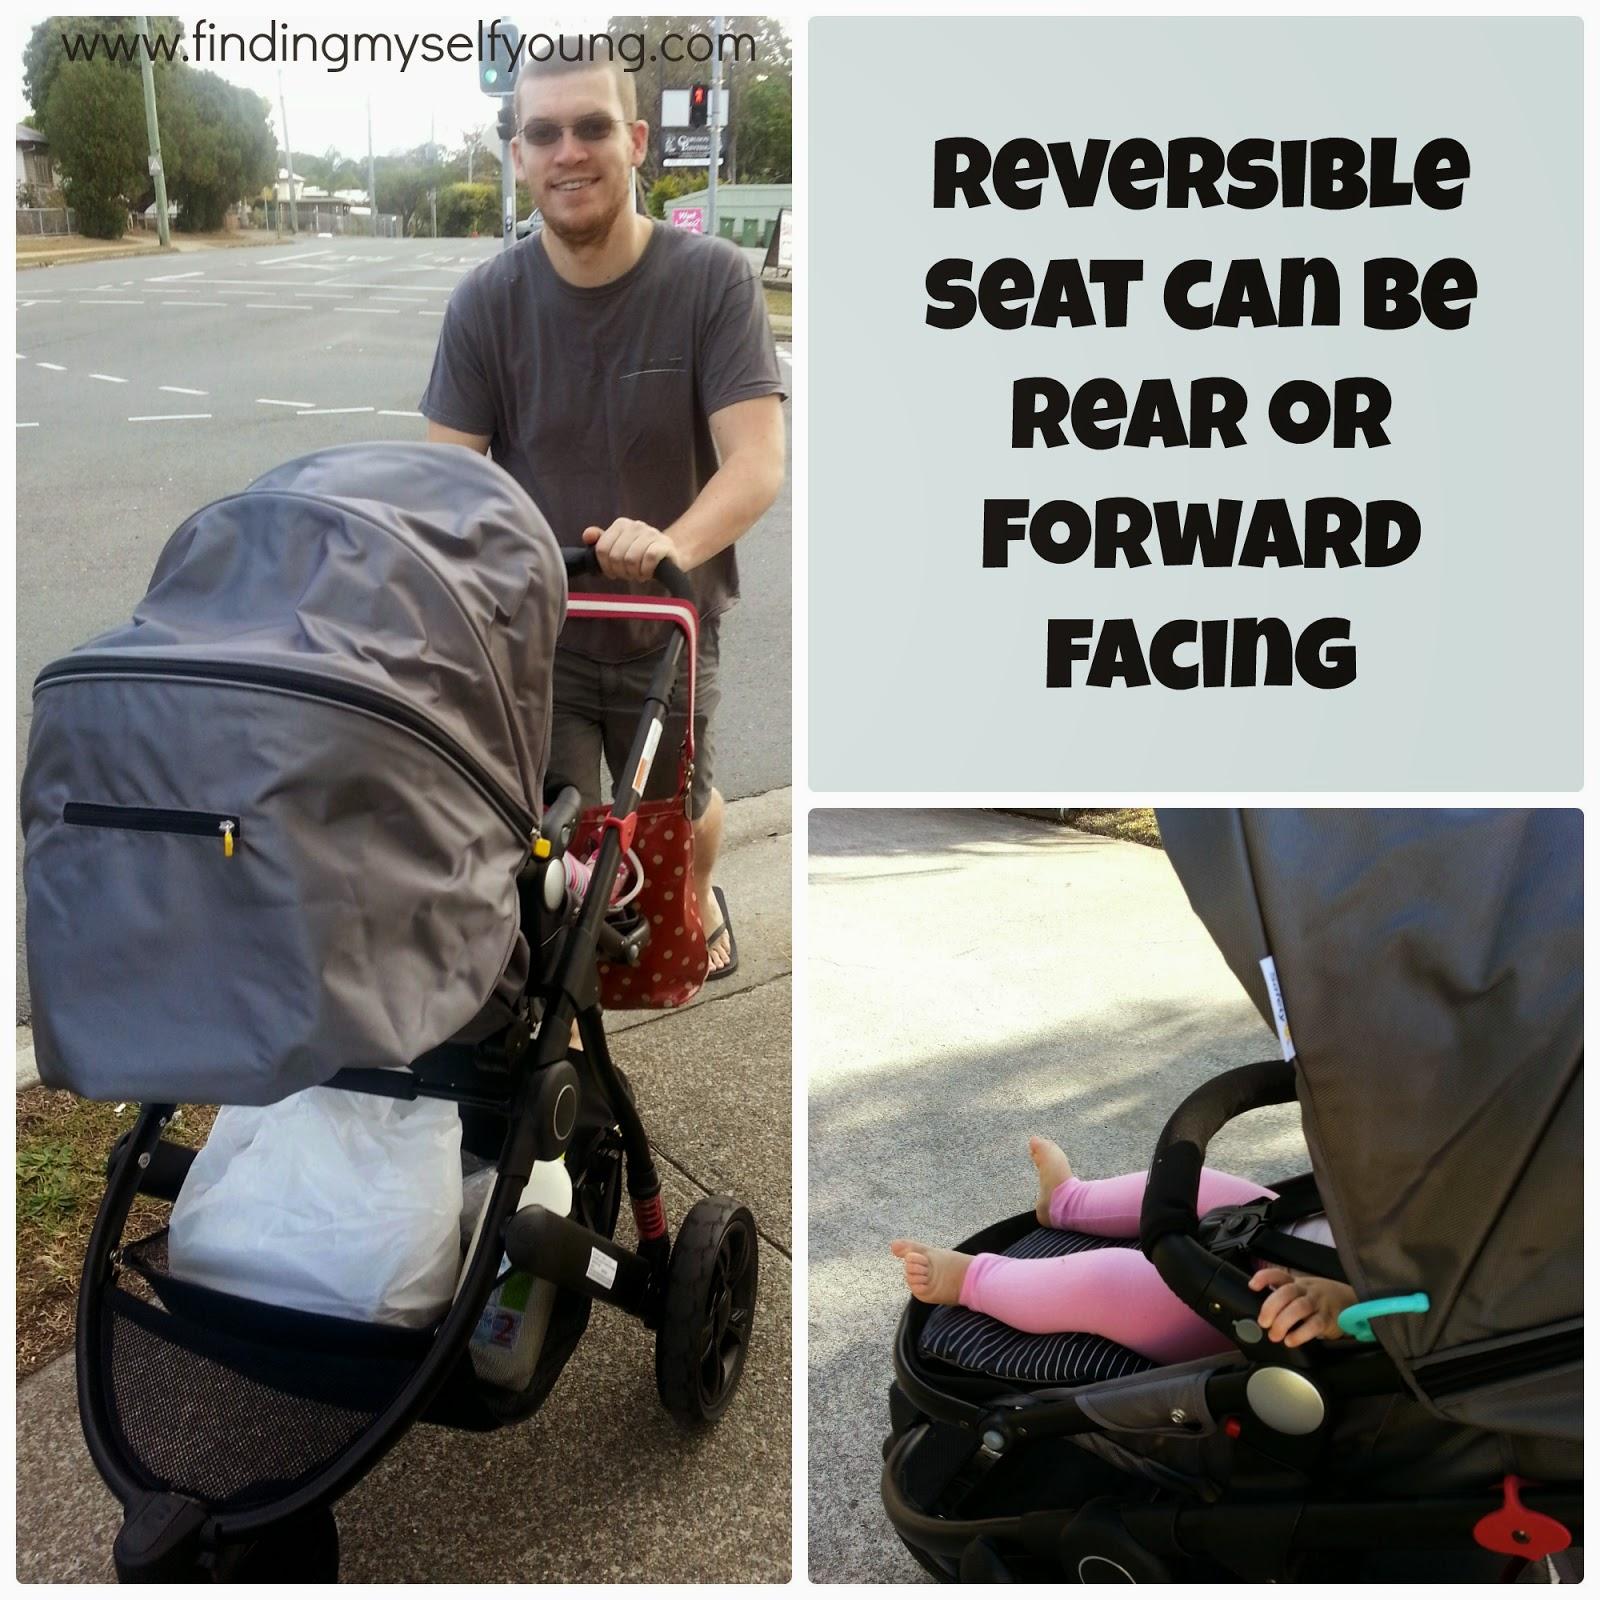 Safety 1st Wanderer pram reversible seat